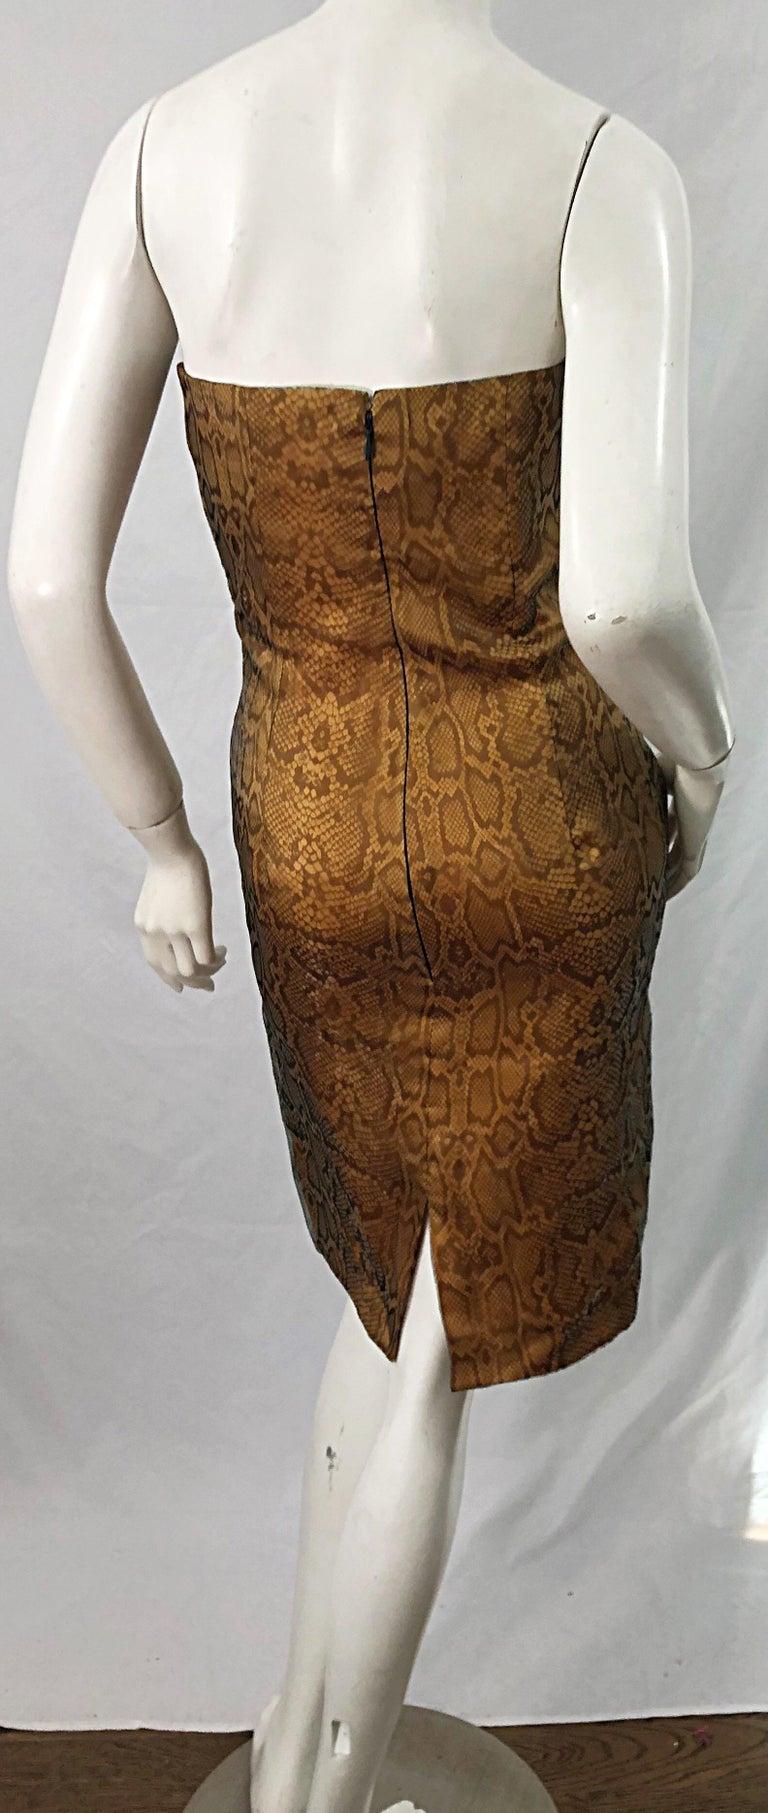 Women's 1990s Luca Luca Size 42 / 6 Snakeskin Silk Organza Strapless 90s Tan Brown Dress For Sale